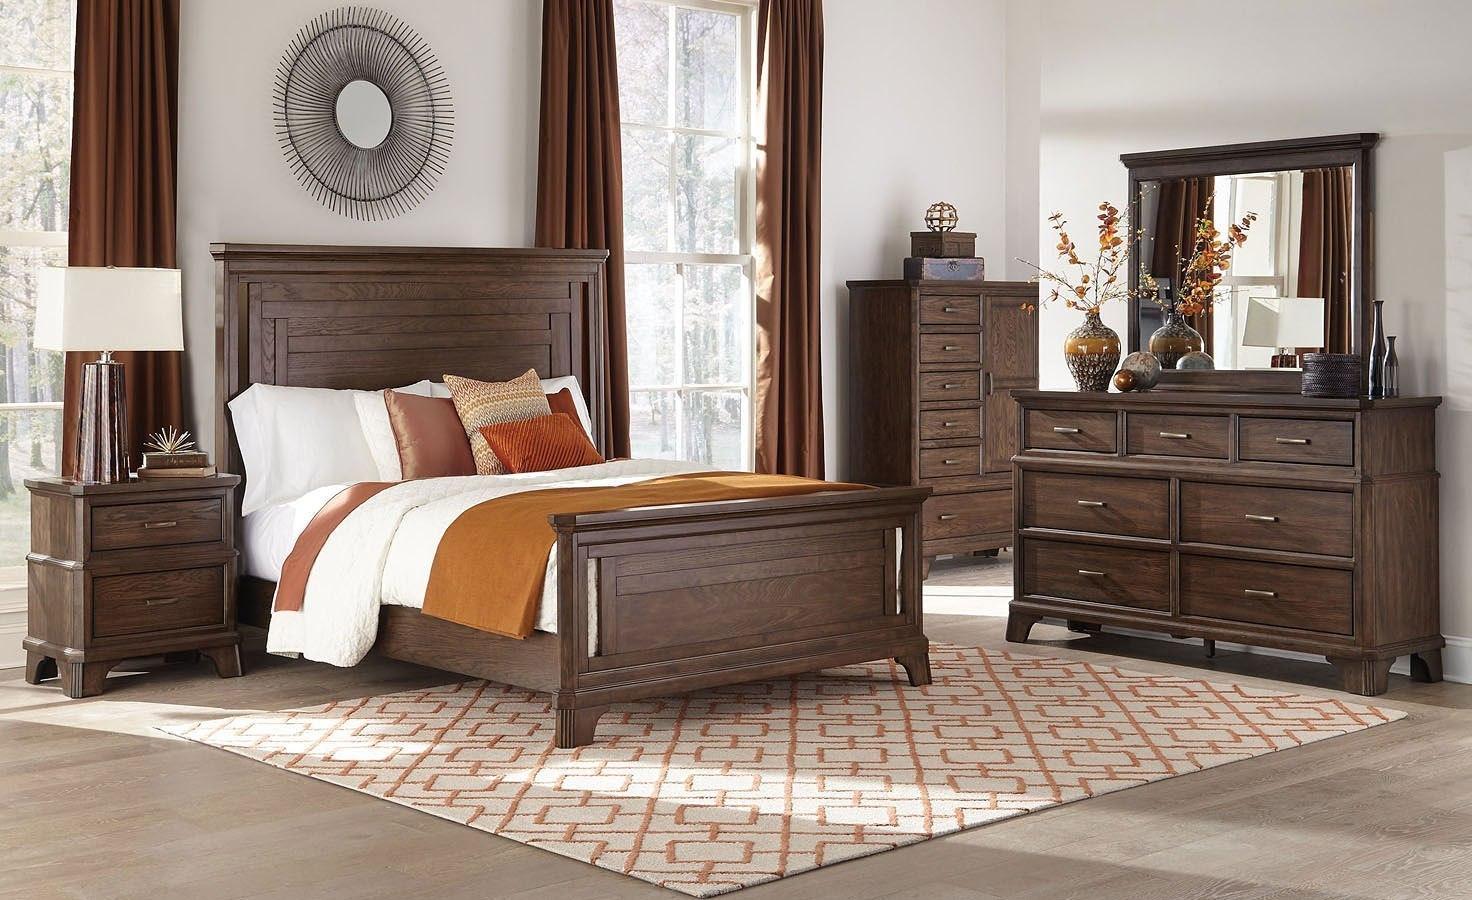 Telluride Panel Bedroom Set By Intercon Furniture